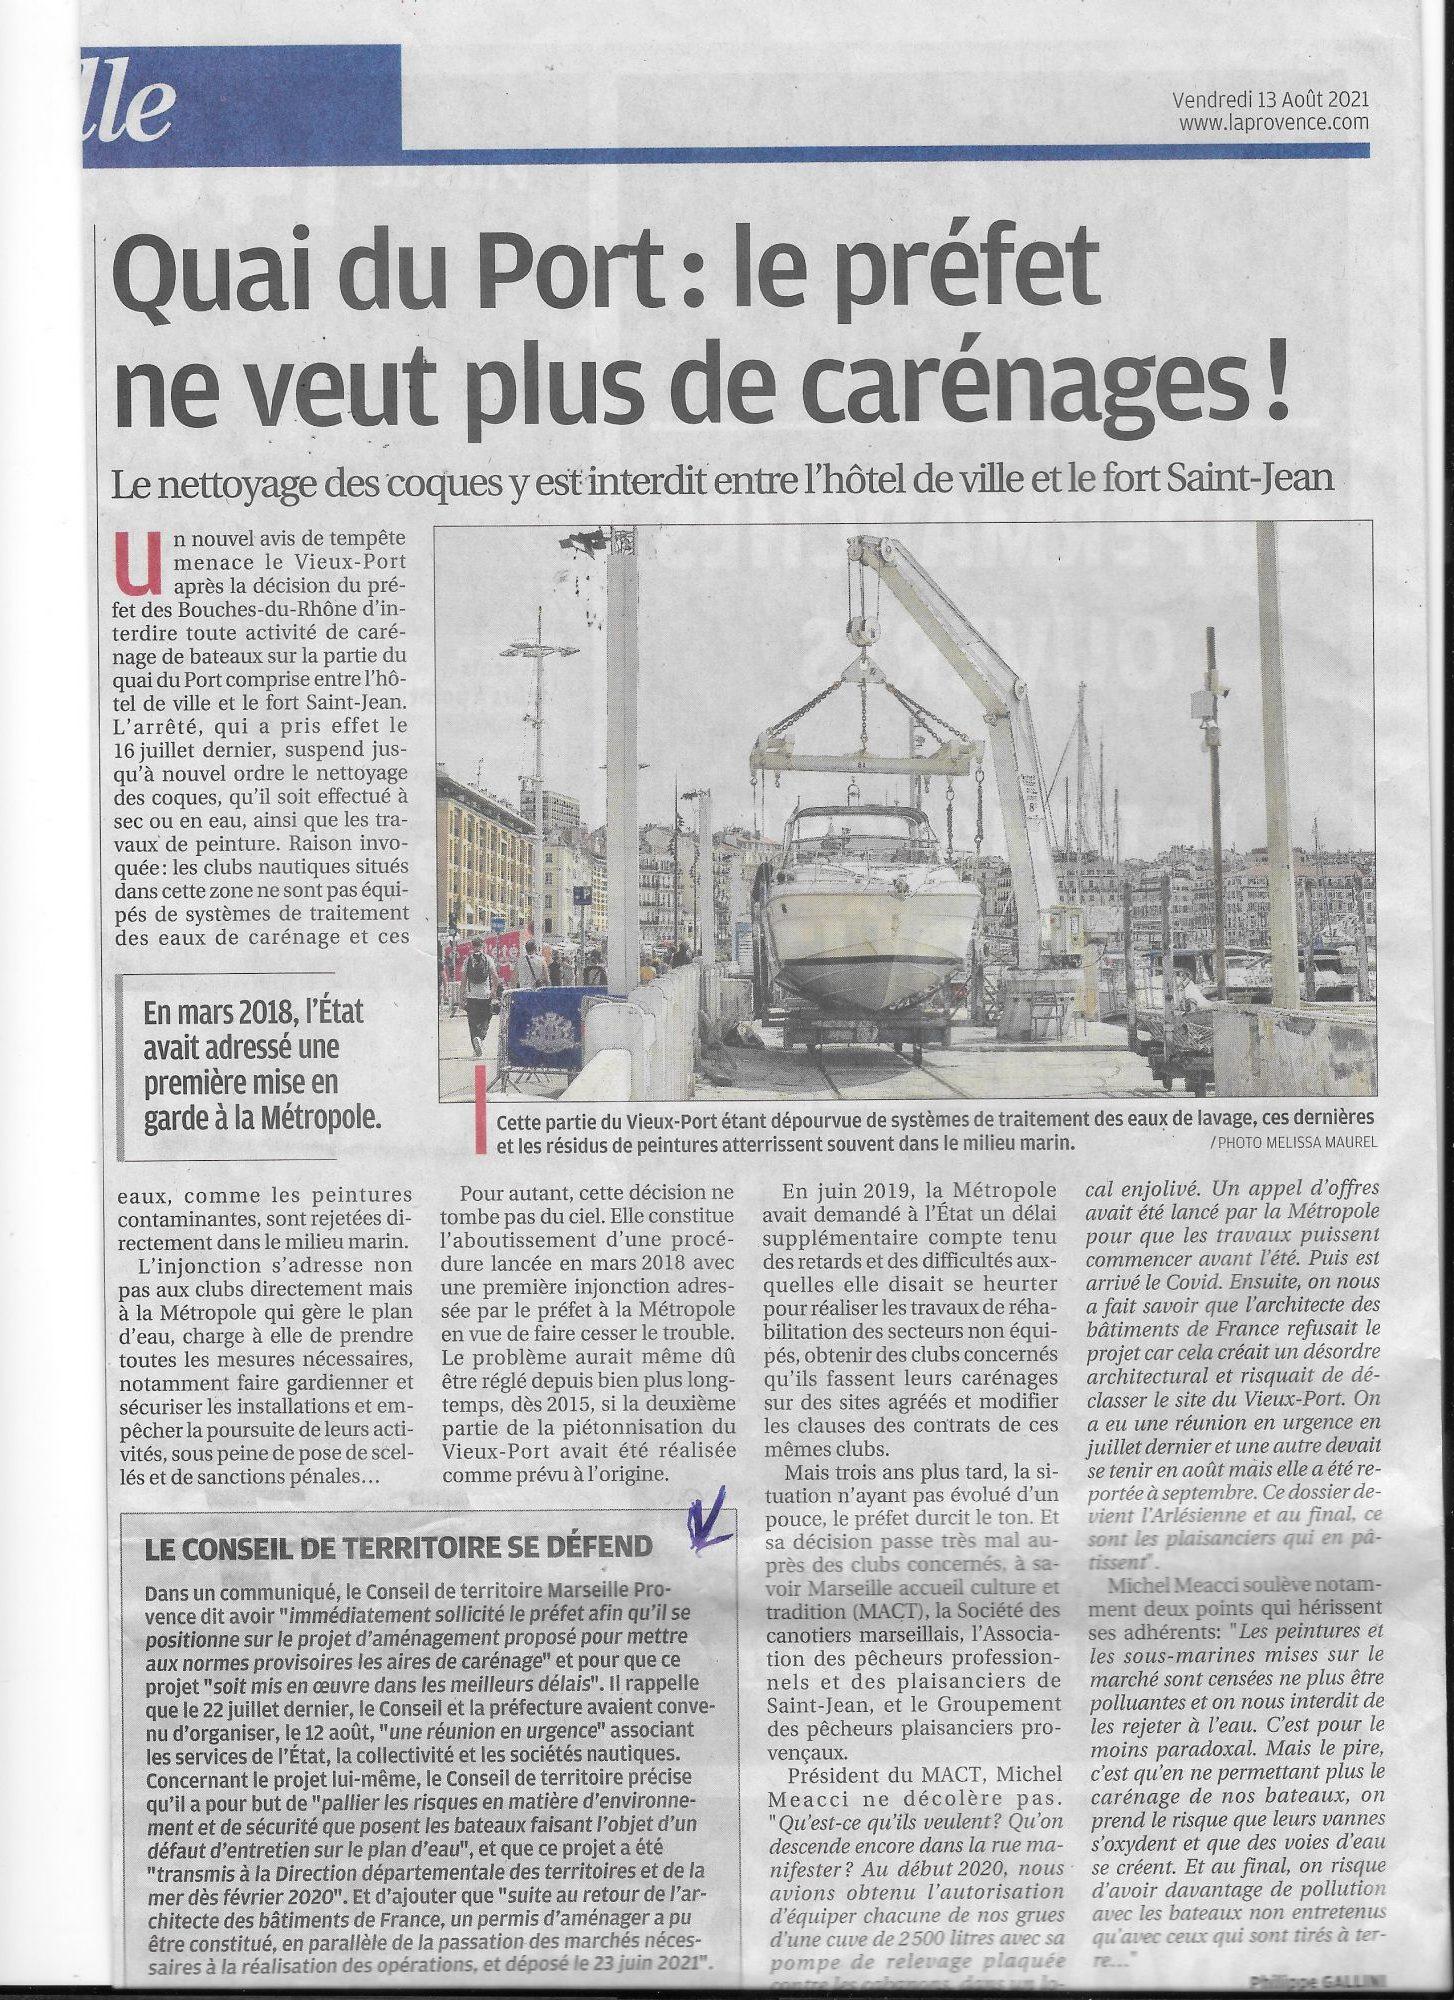 2021 08 Article Provence Carénage